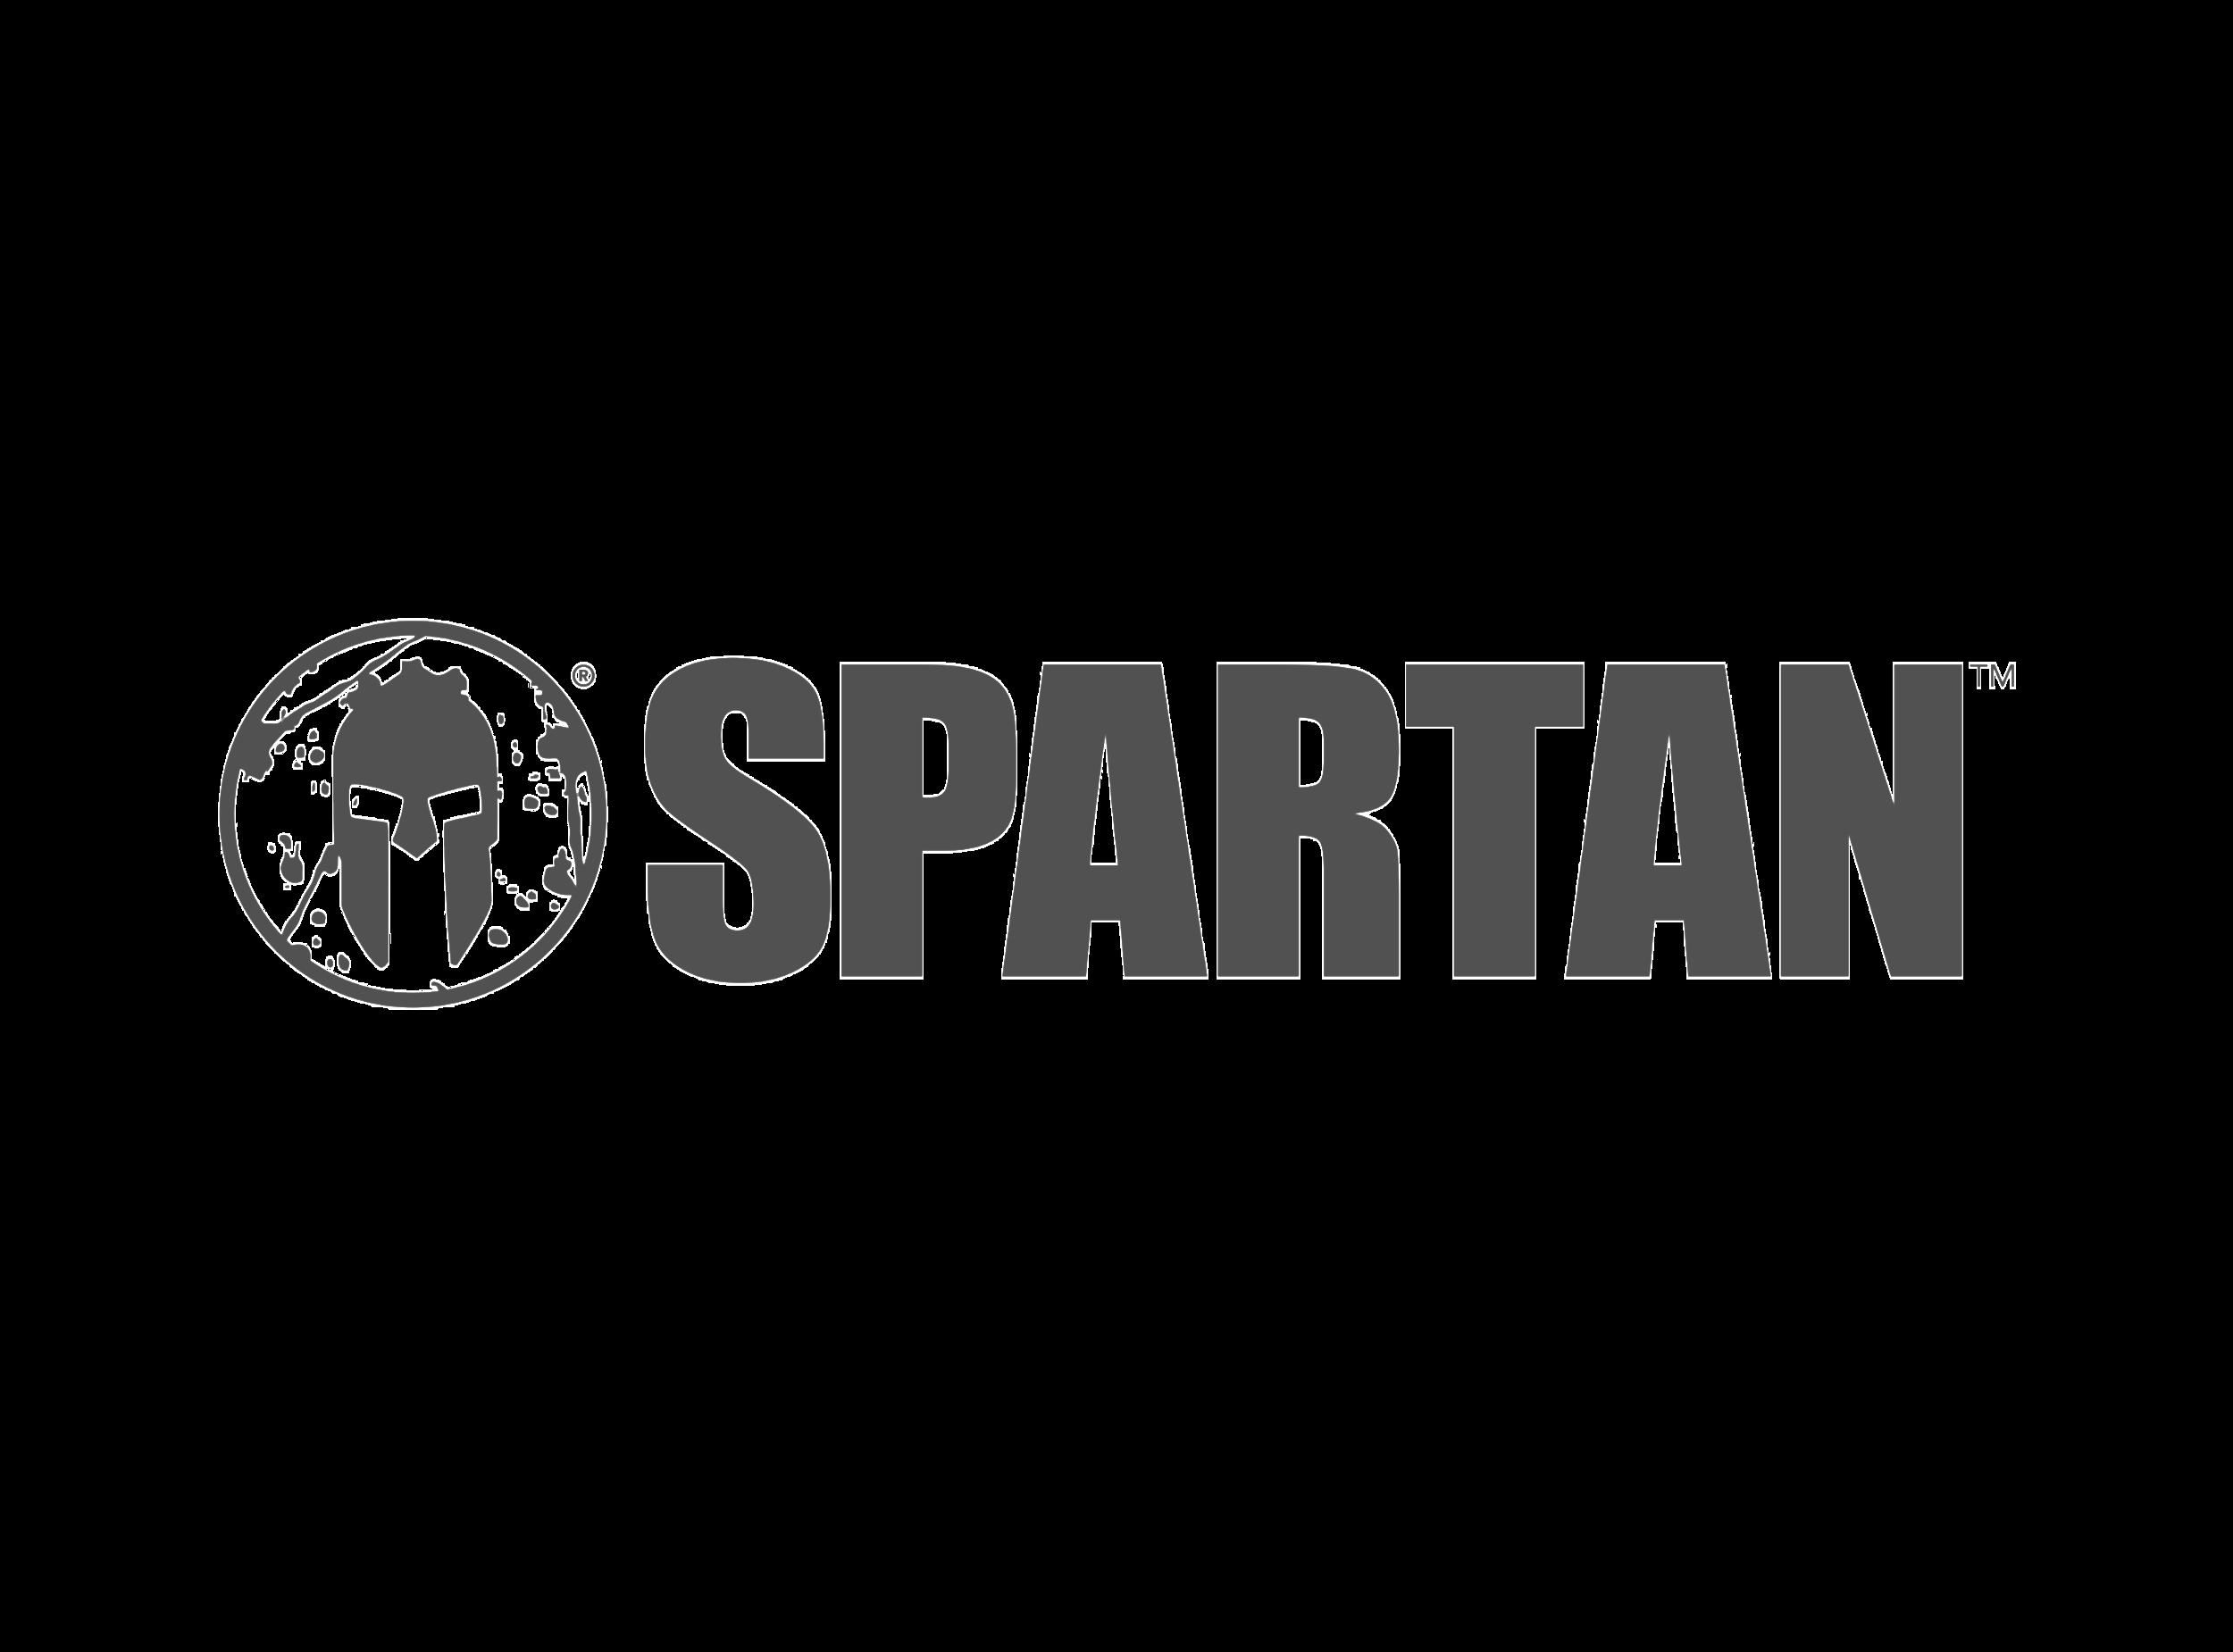 Spartan.png